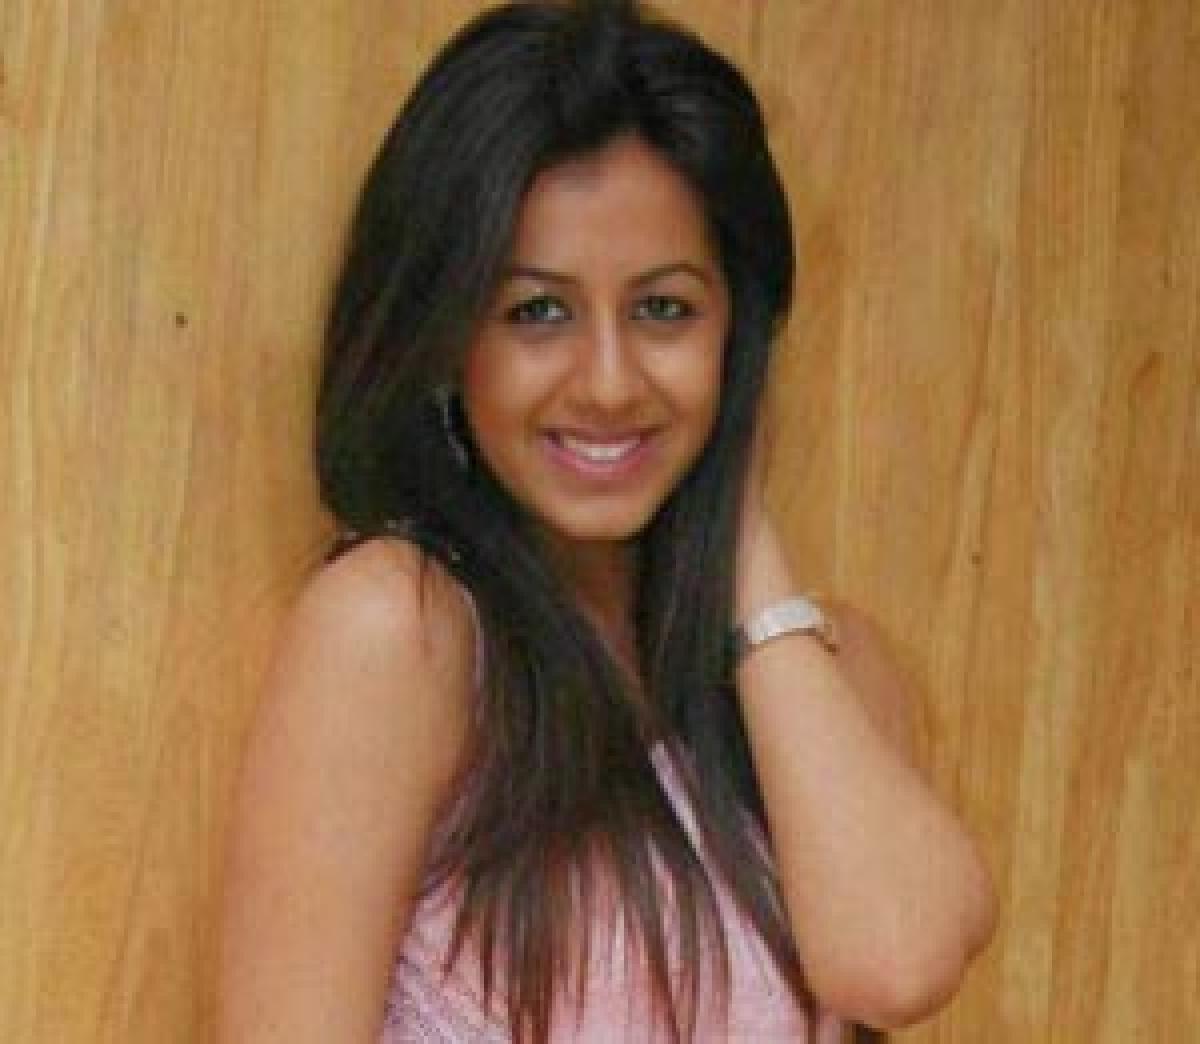 Nikki is a big fan of Pawan Kalyan